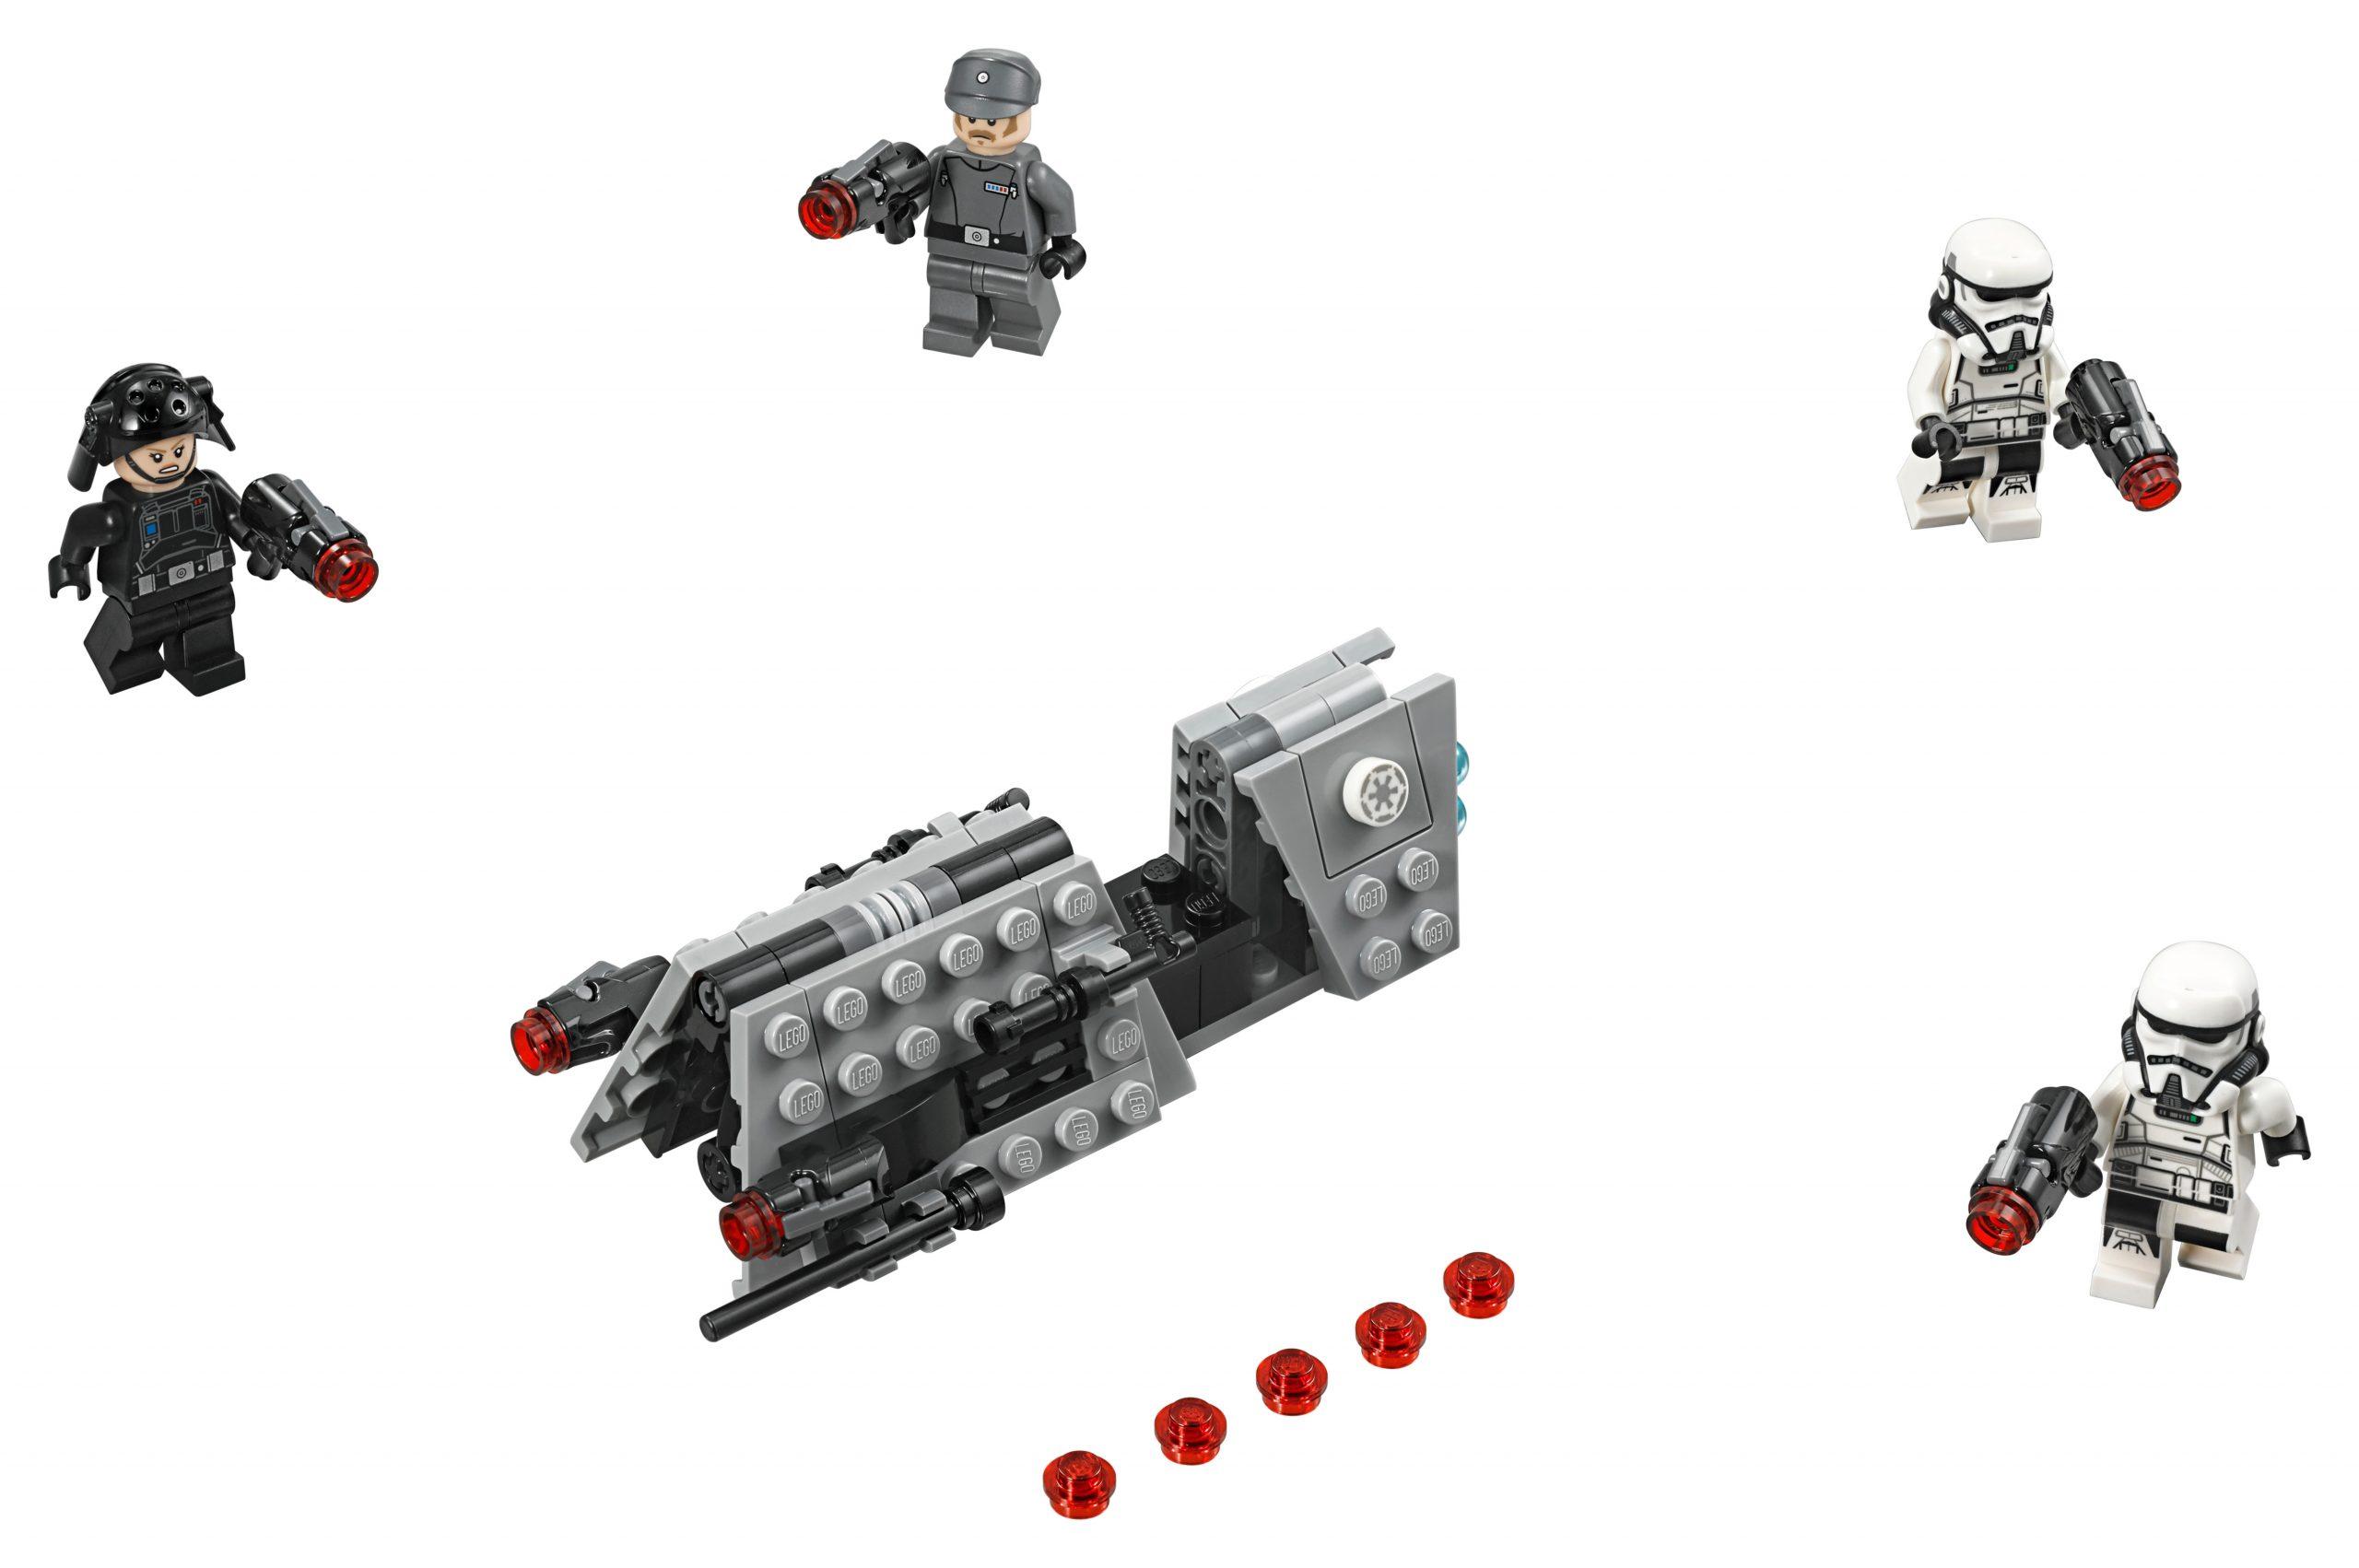 lego keizerlijke patrouille battle pack 75207 scaled